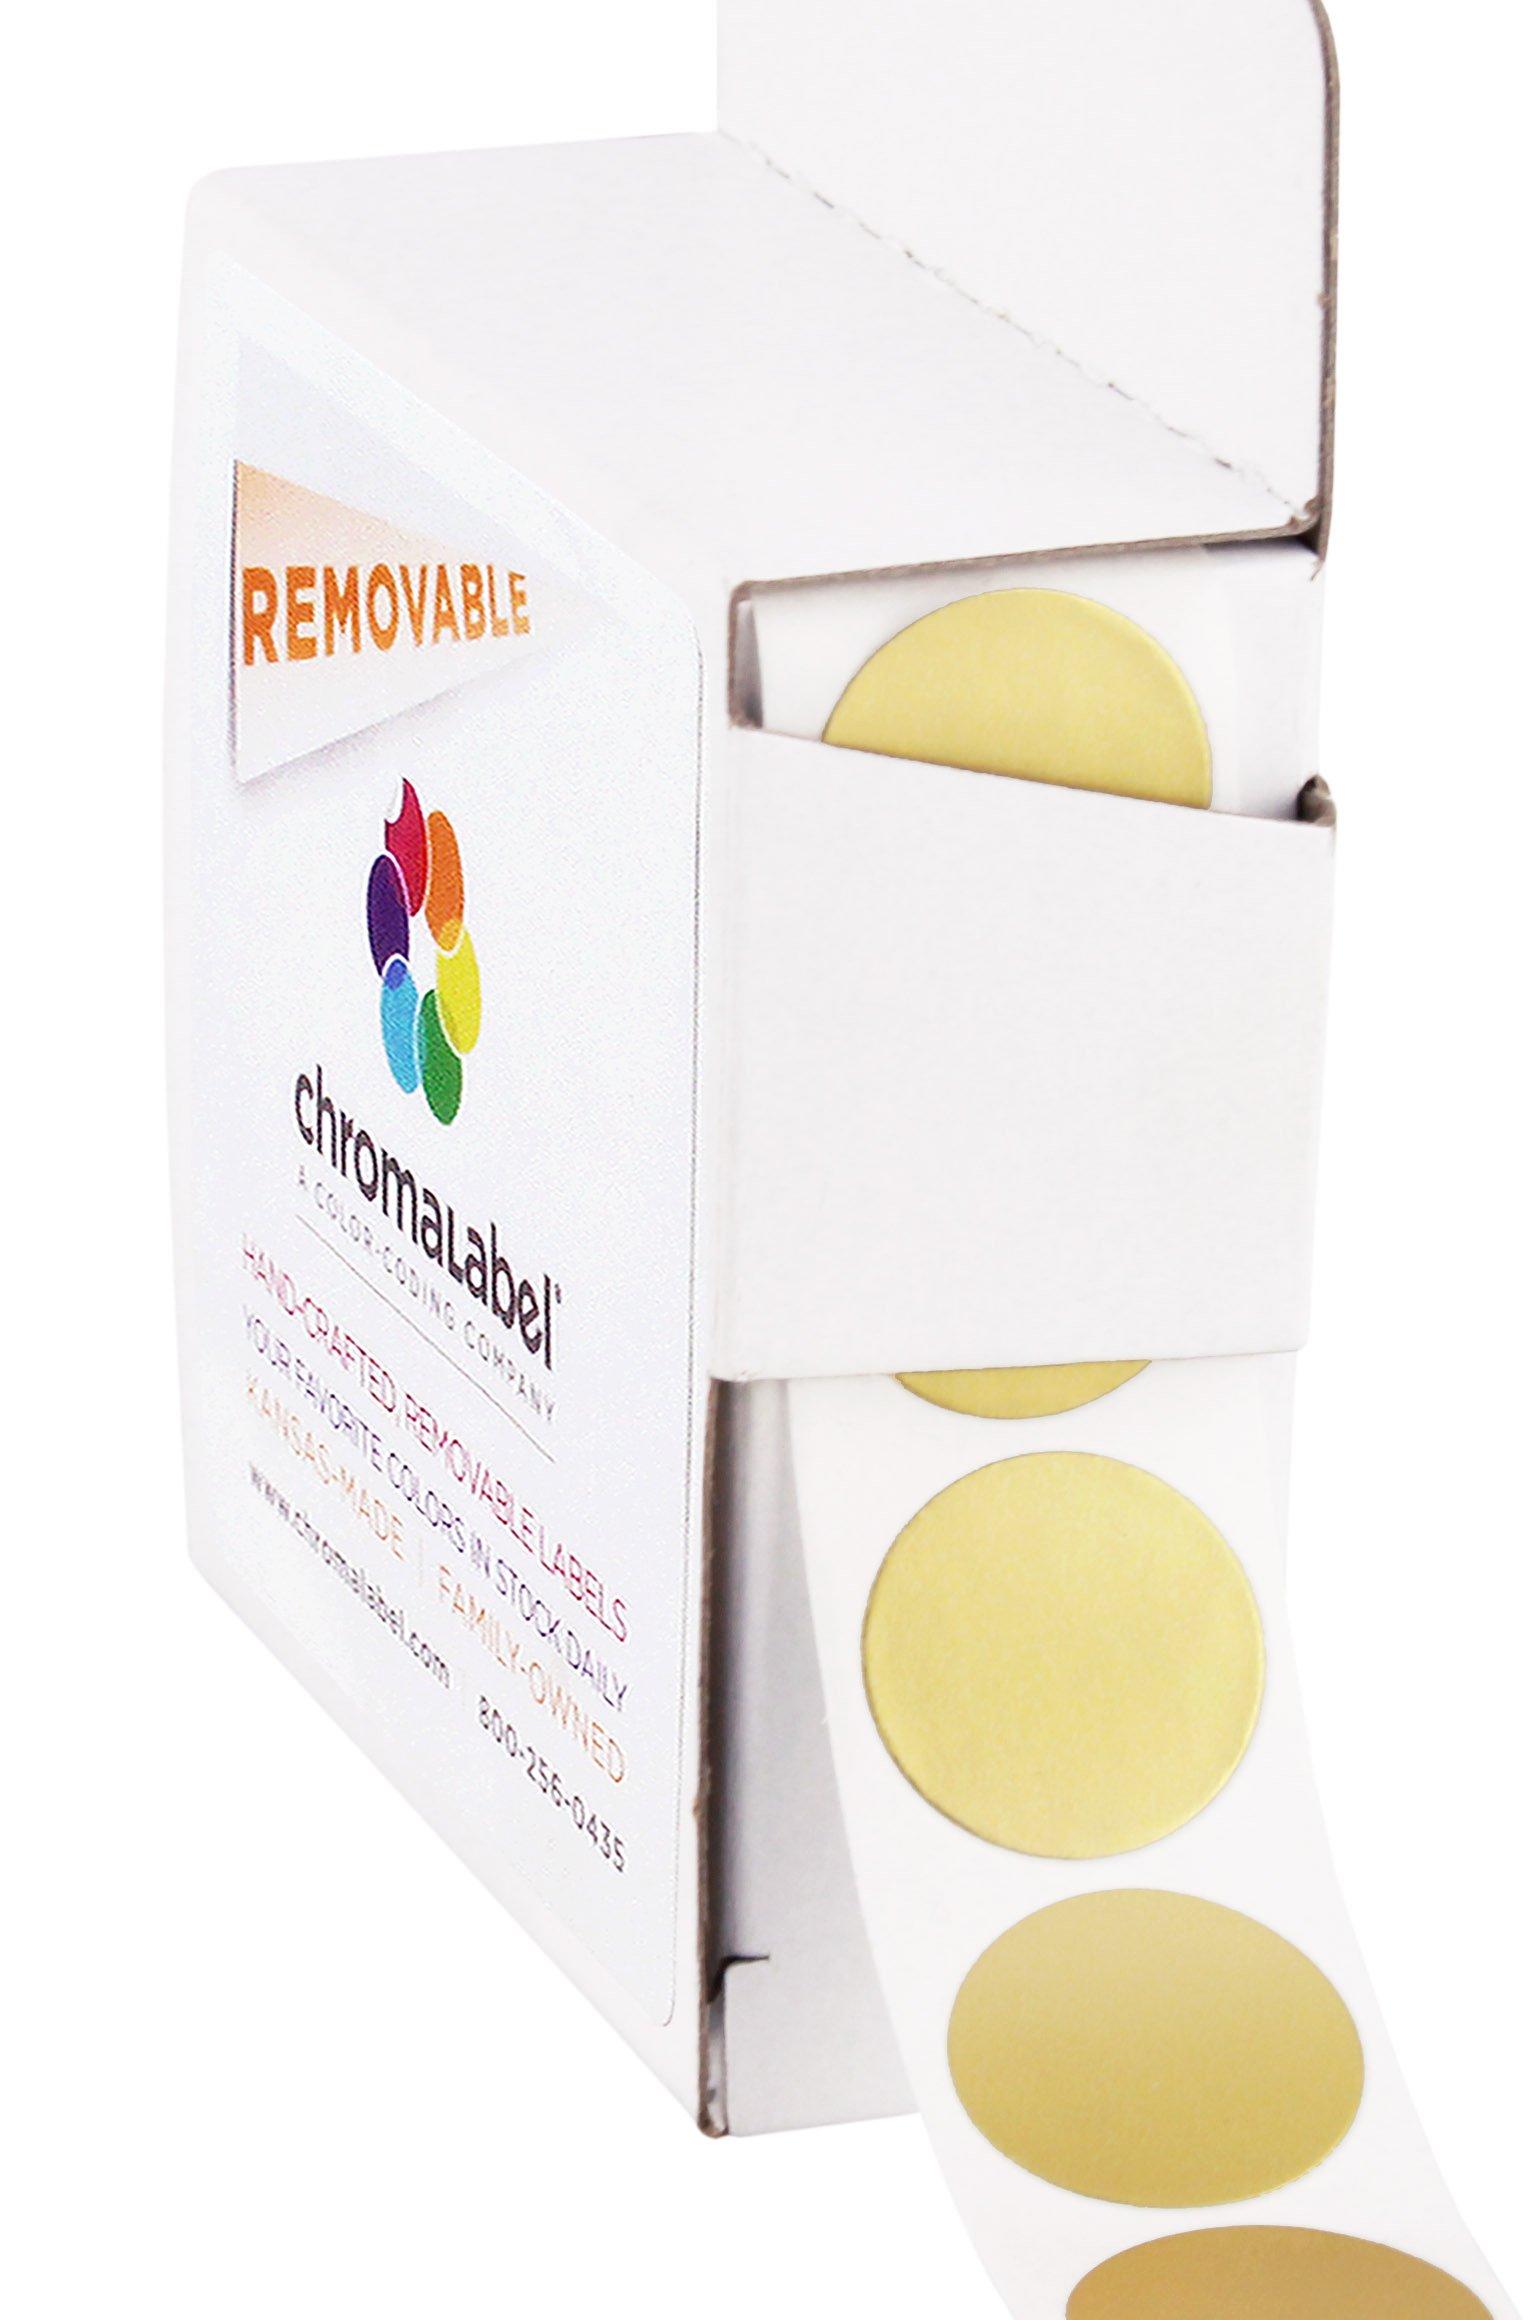 ChromaLabel 3/4 Inch Round Removable Color-Code Dot Stickers, 1000 per Dispenser Box, Gold